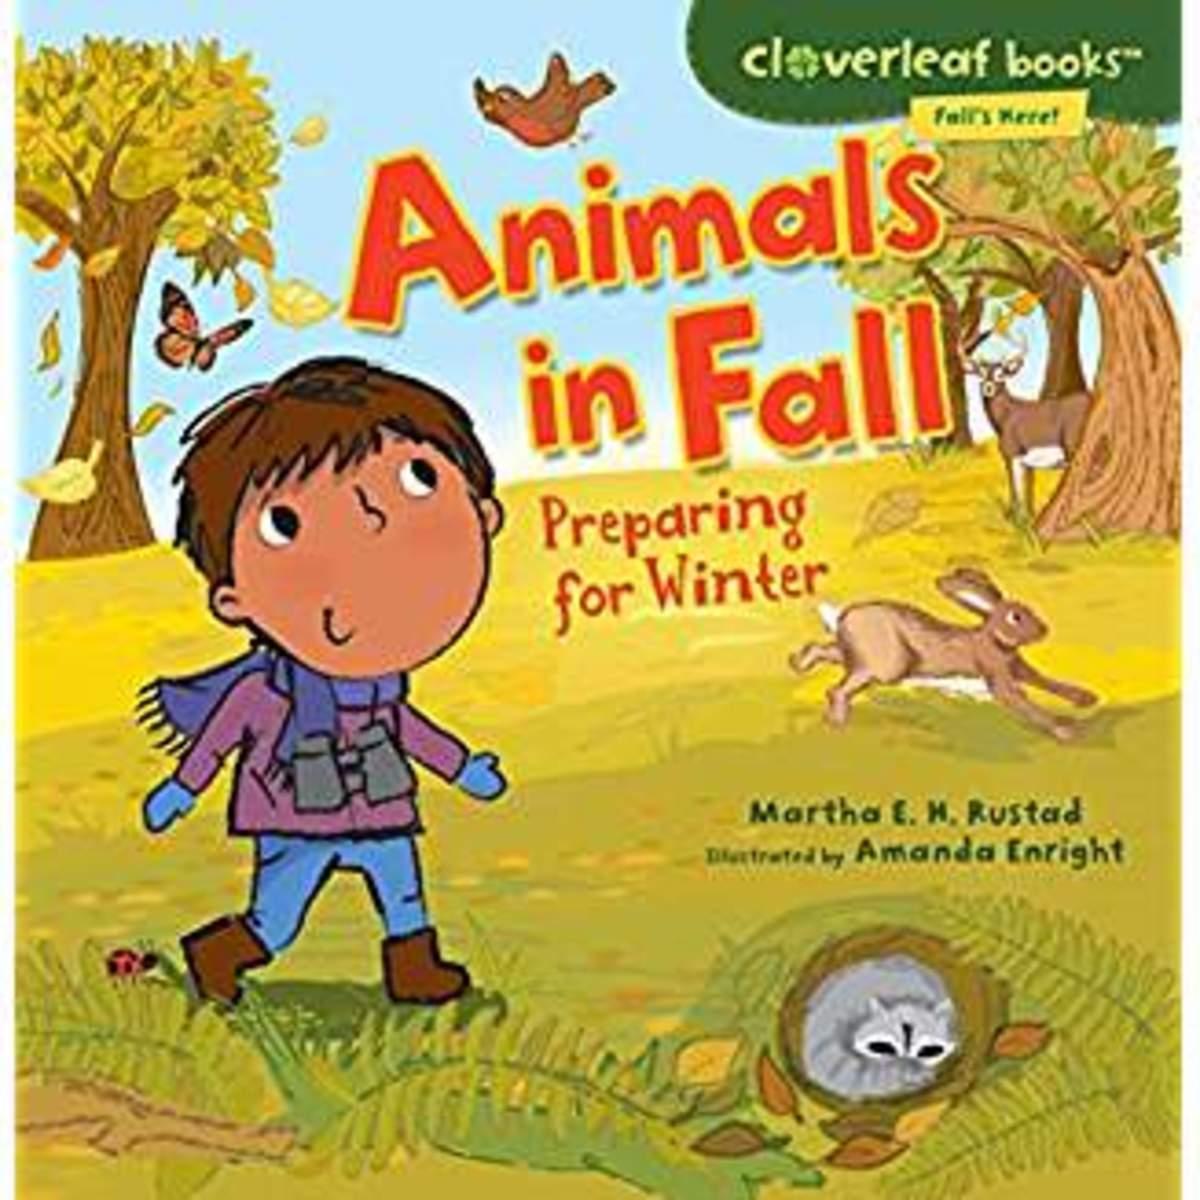 Animals in the Fall: Preparing for Winter by Martha E. H. Rustad